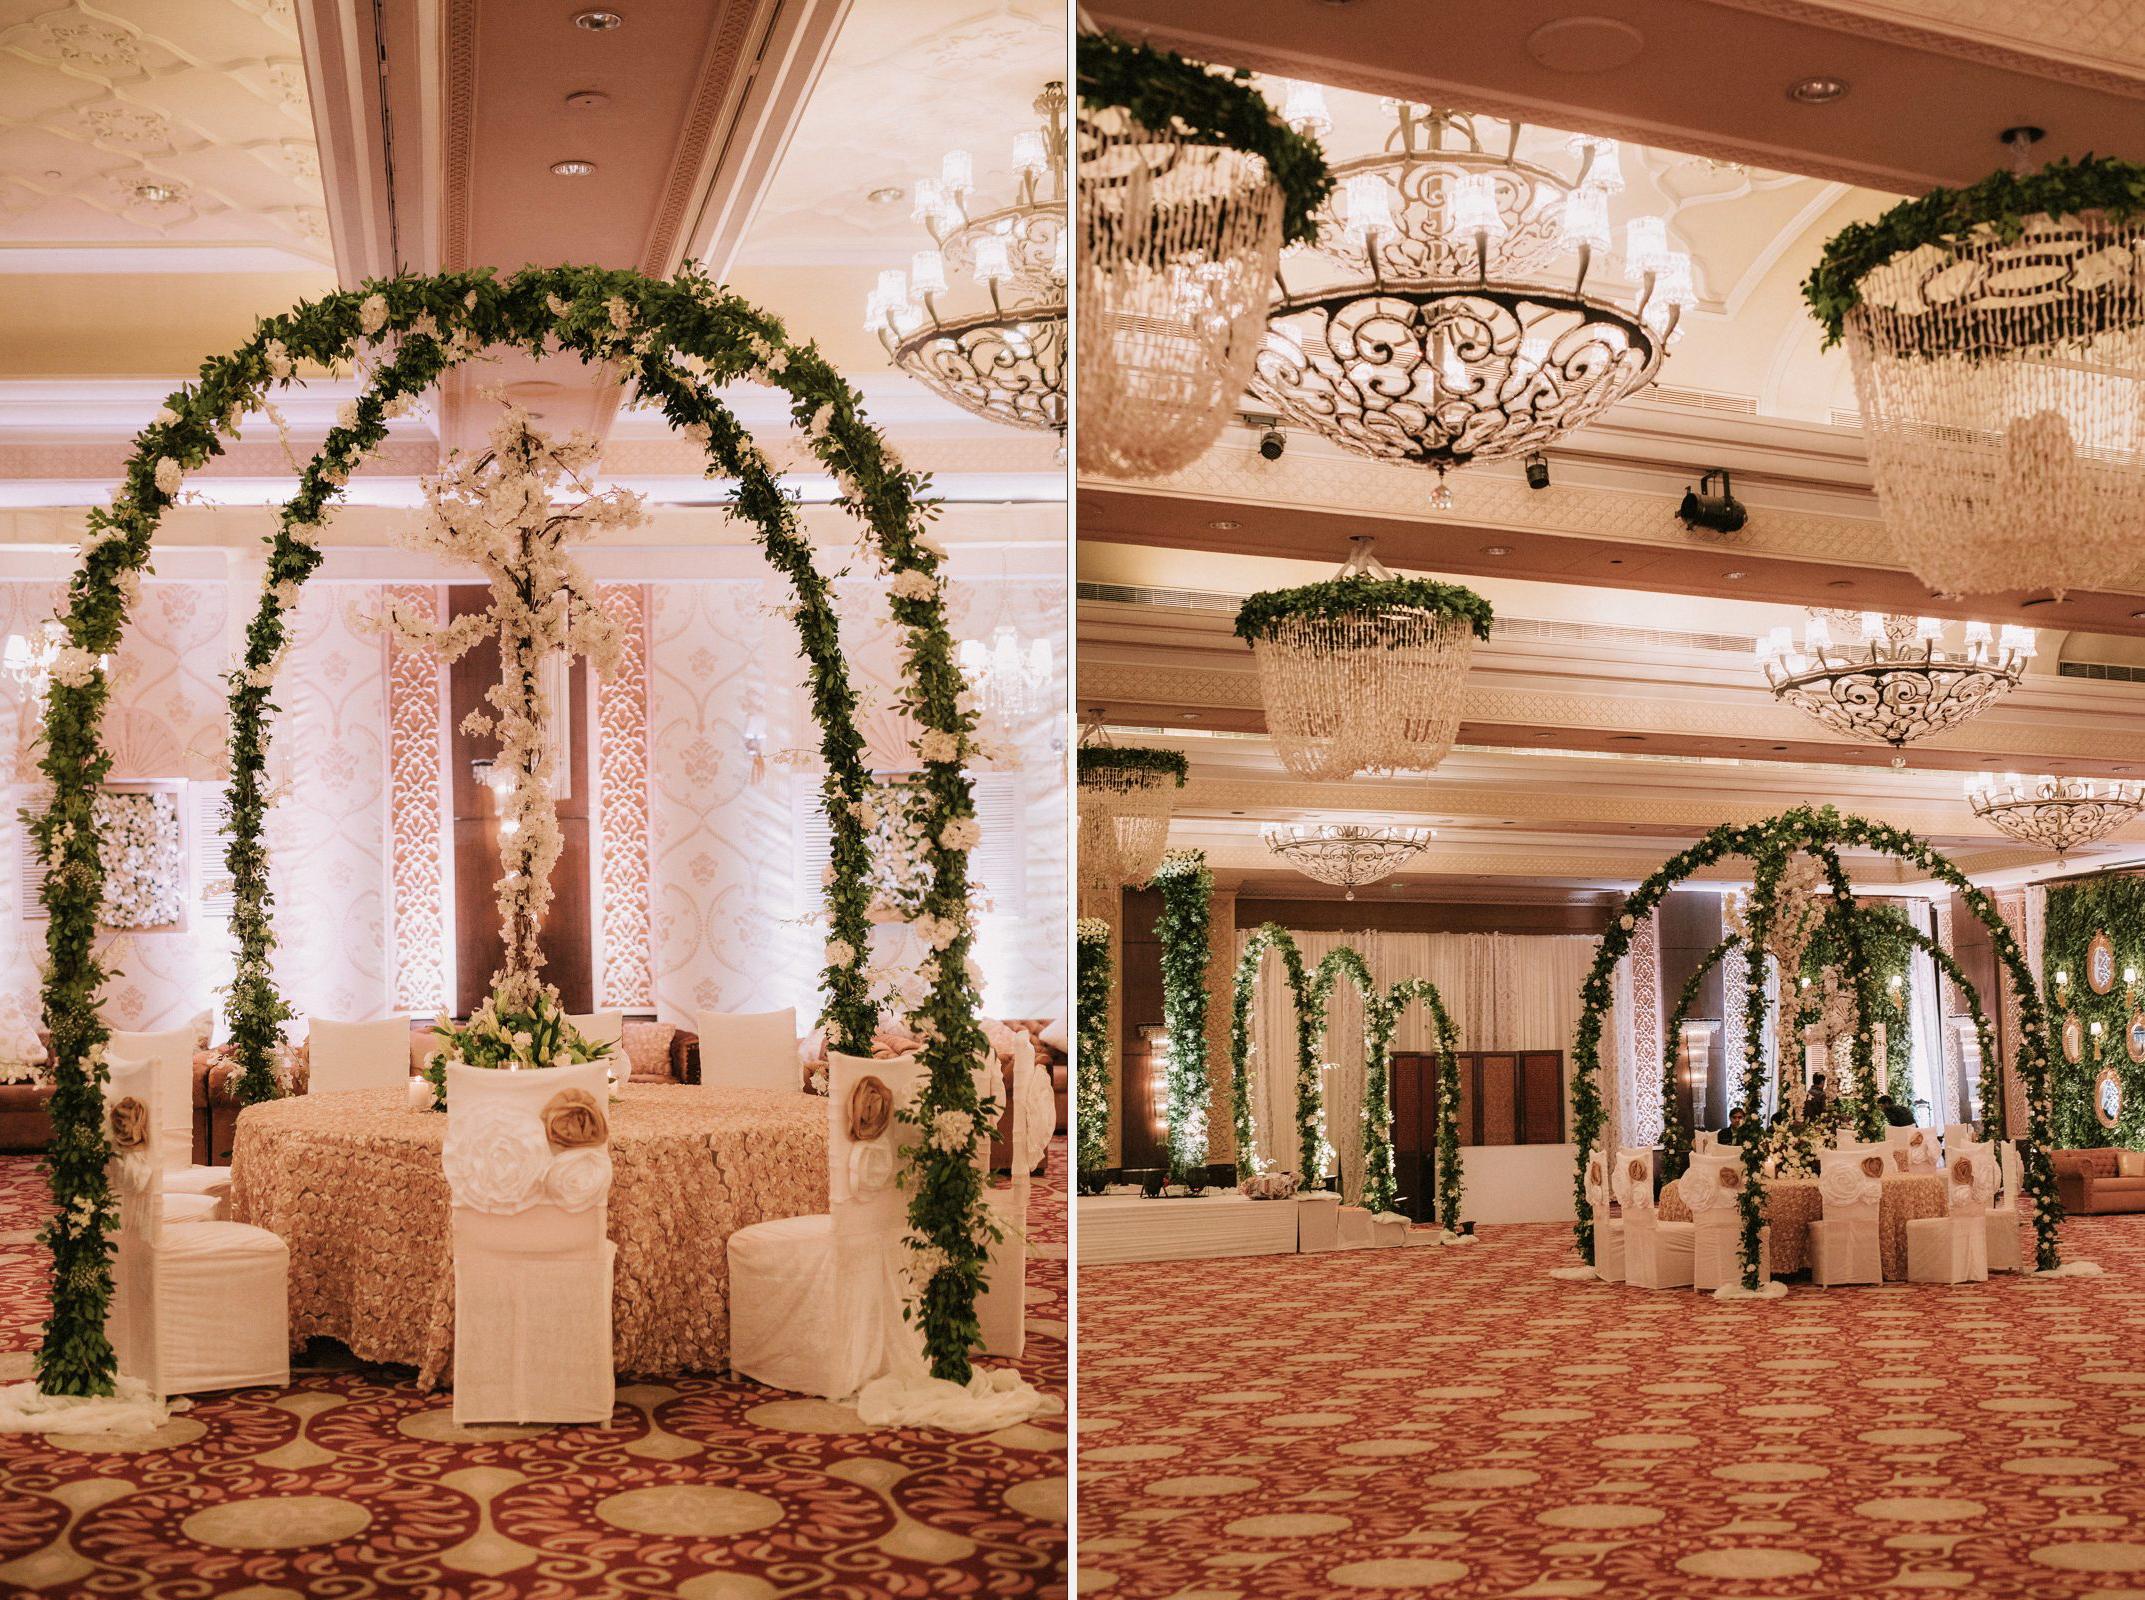 wedding in india - destination wedding photographer-270.jpg